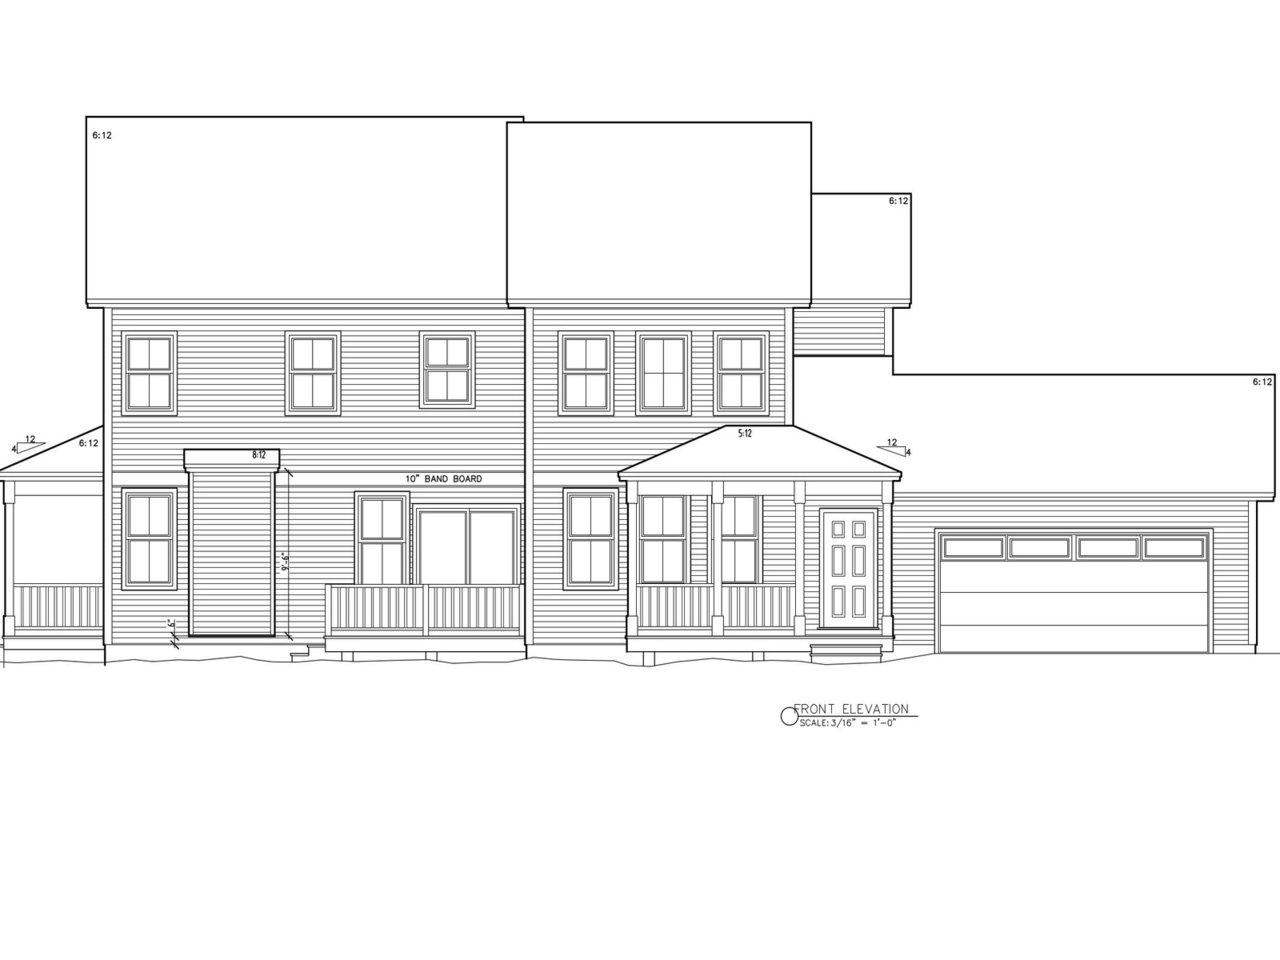 225 Midland Avenue, South Burlington, Vermont 05403-7118, 3 Bedrooms Bedrooms, ,3 BathroomsBathrooms,Residential,For Sale,225 Midland Avenue,2,4853782